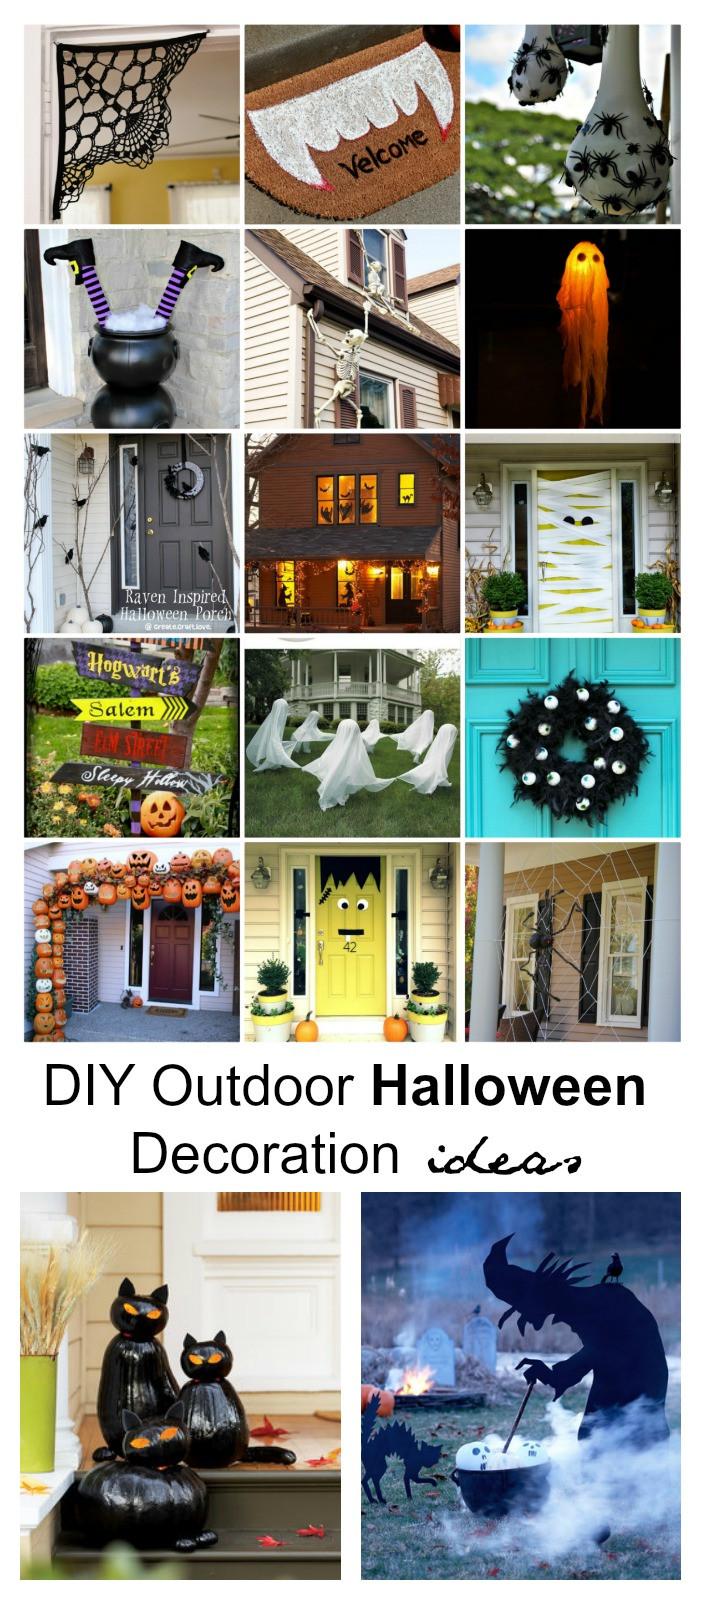 Halloween Decoration Outdoor  DIY Outdoor Halloween Decorations The Idea Room